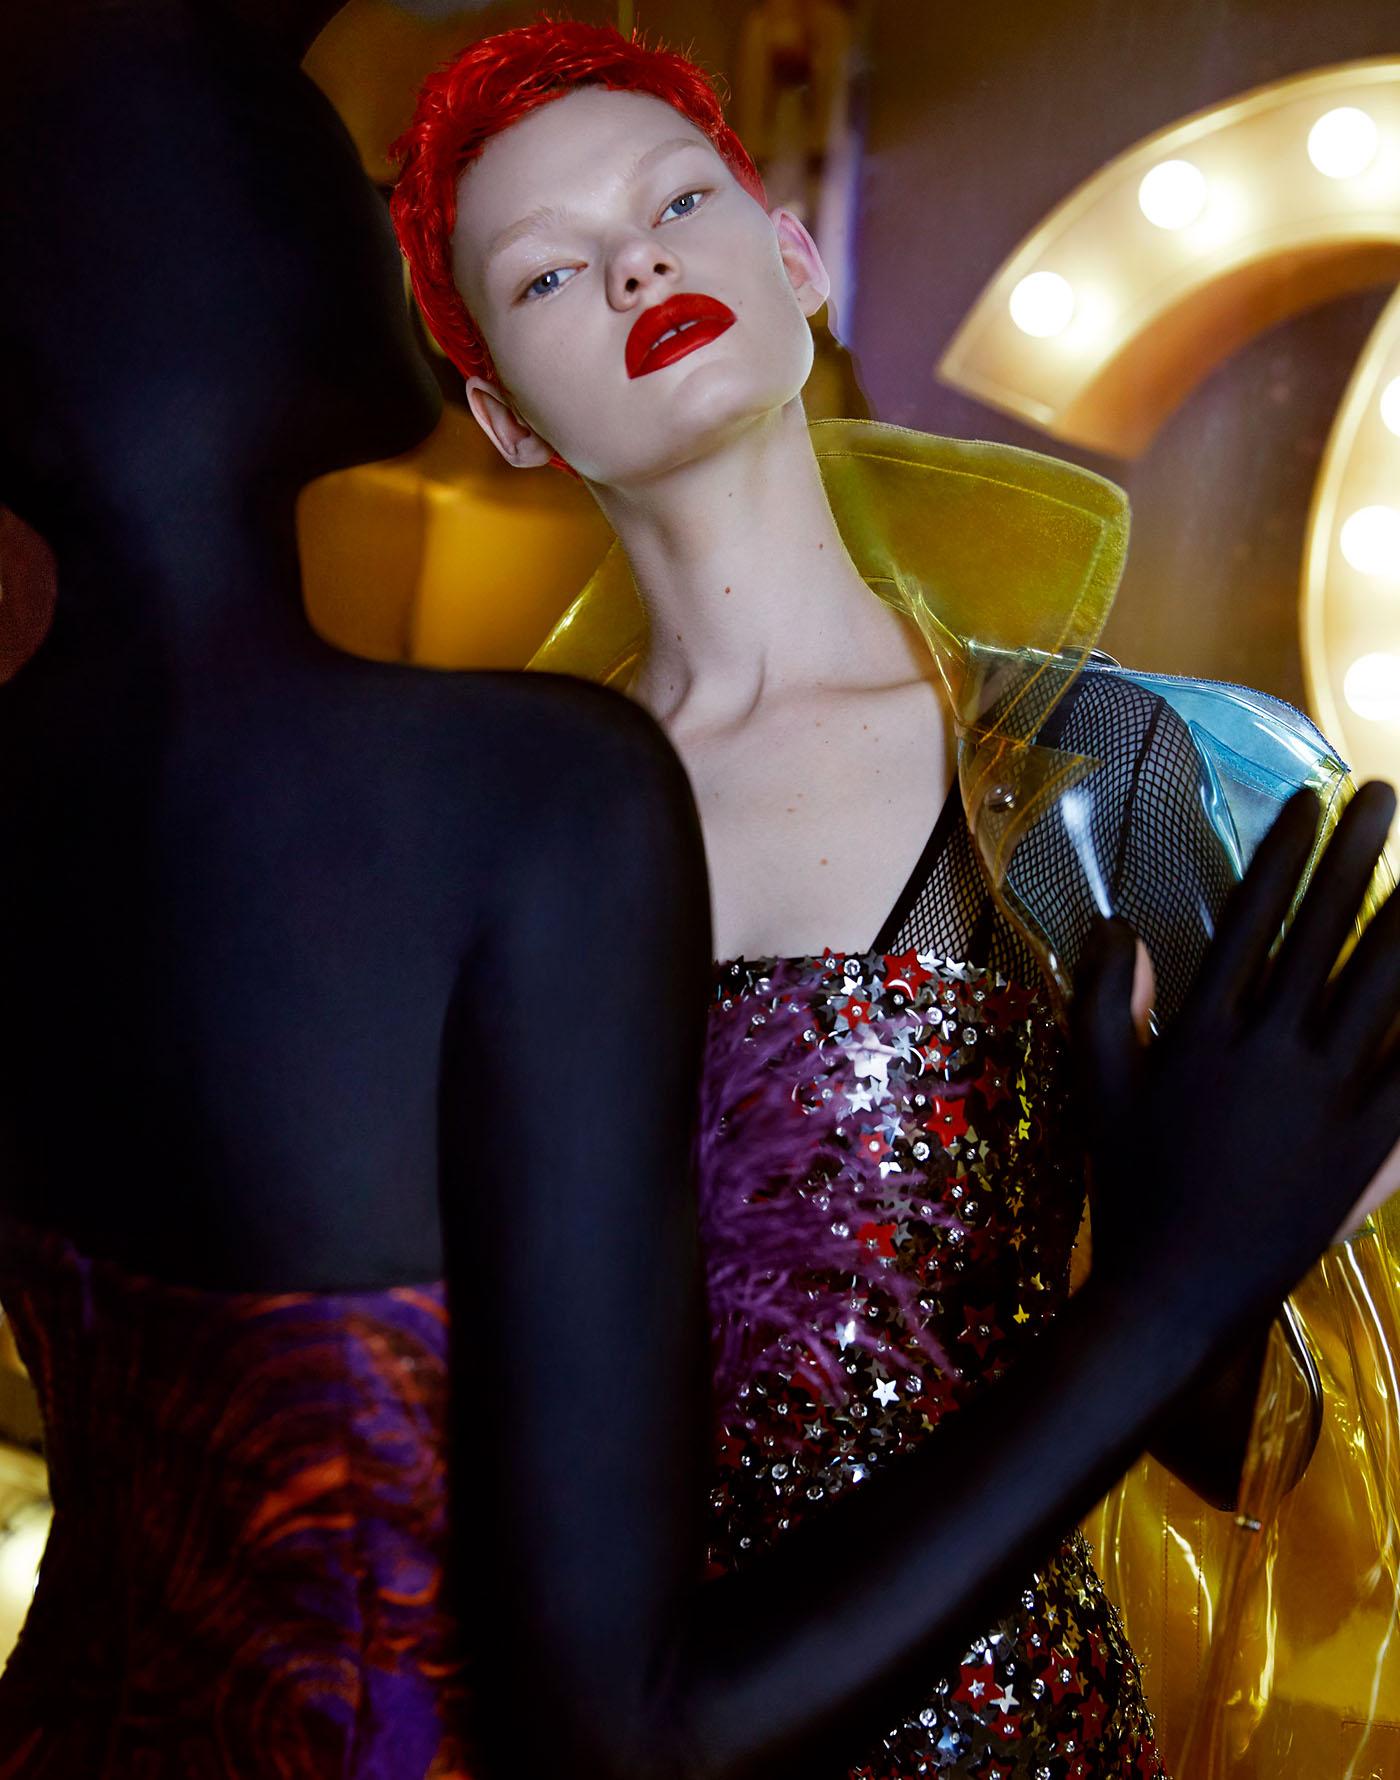 Kelly Mittendorf Consumerism для Bazaar China / фото TGIMAGE STUDIO